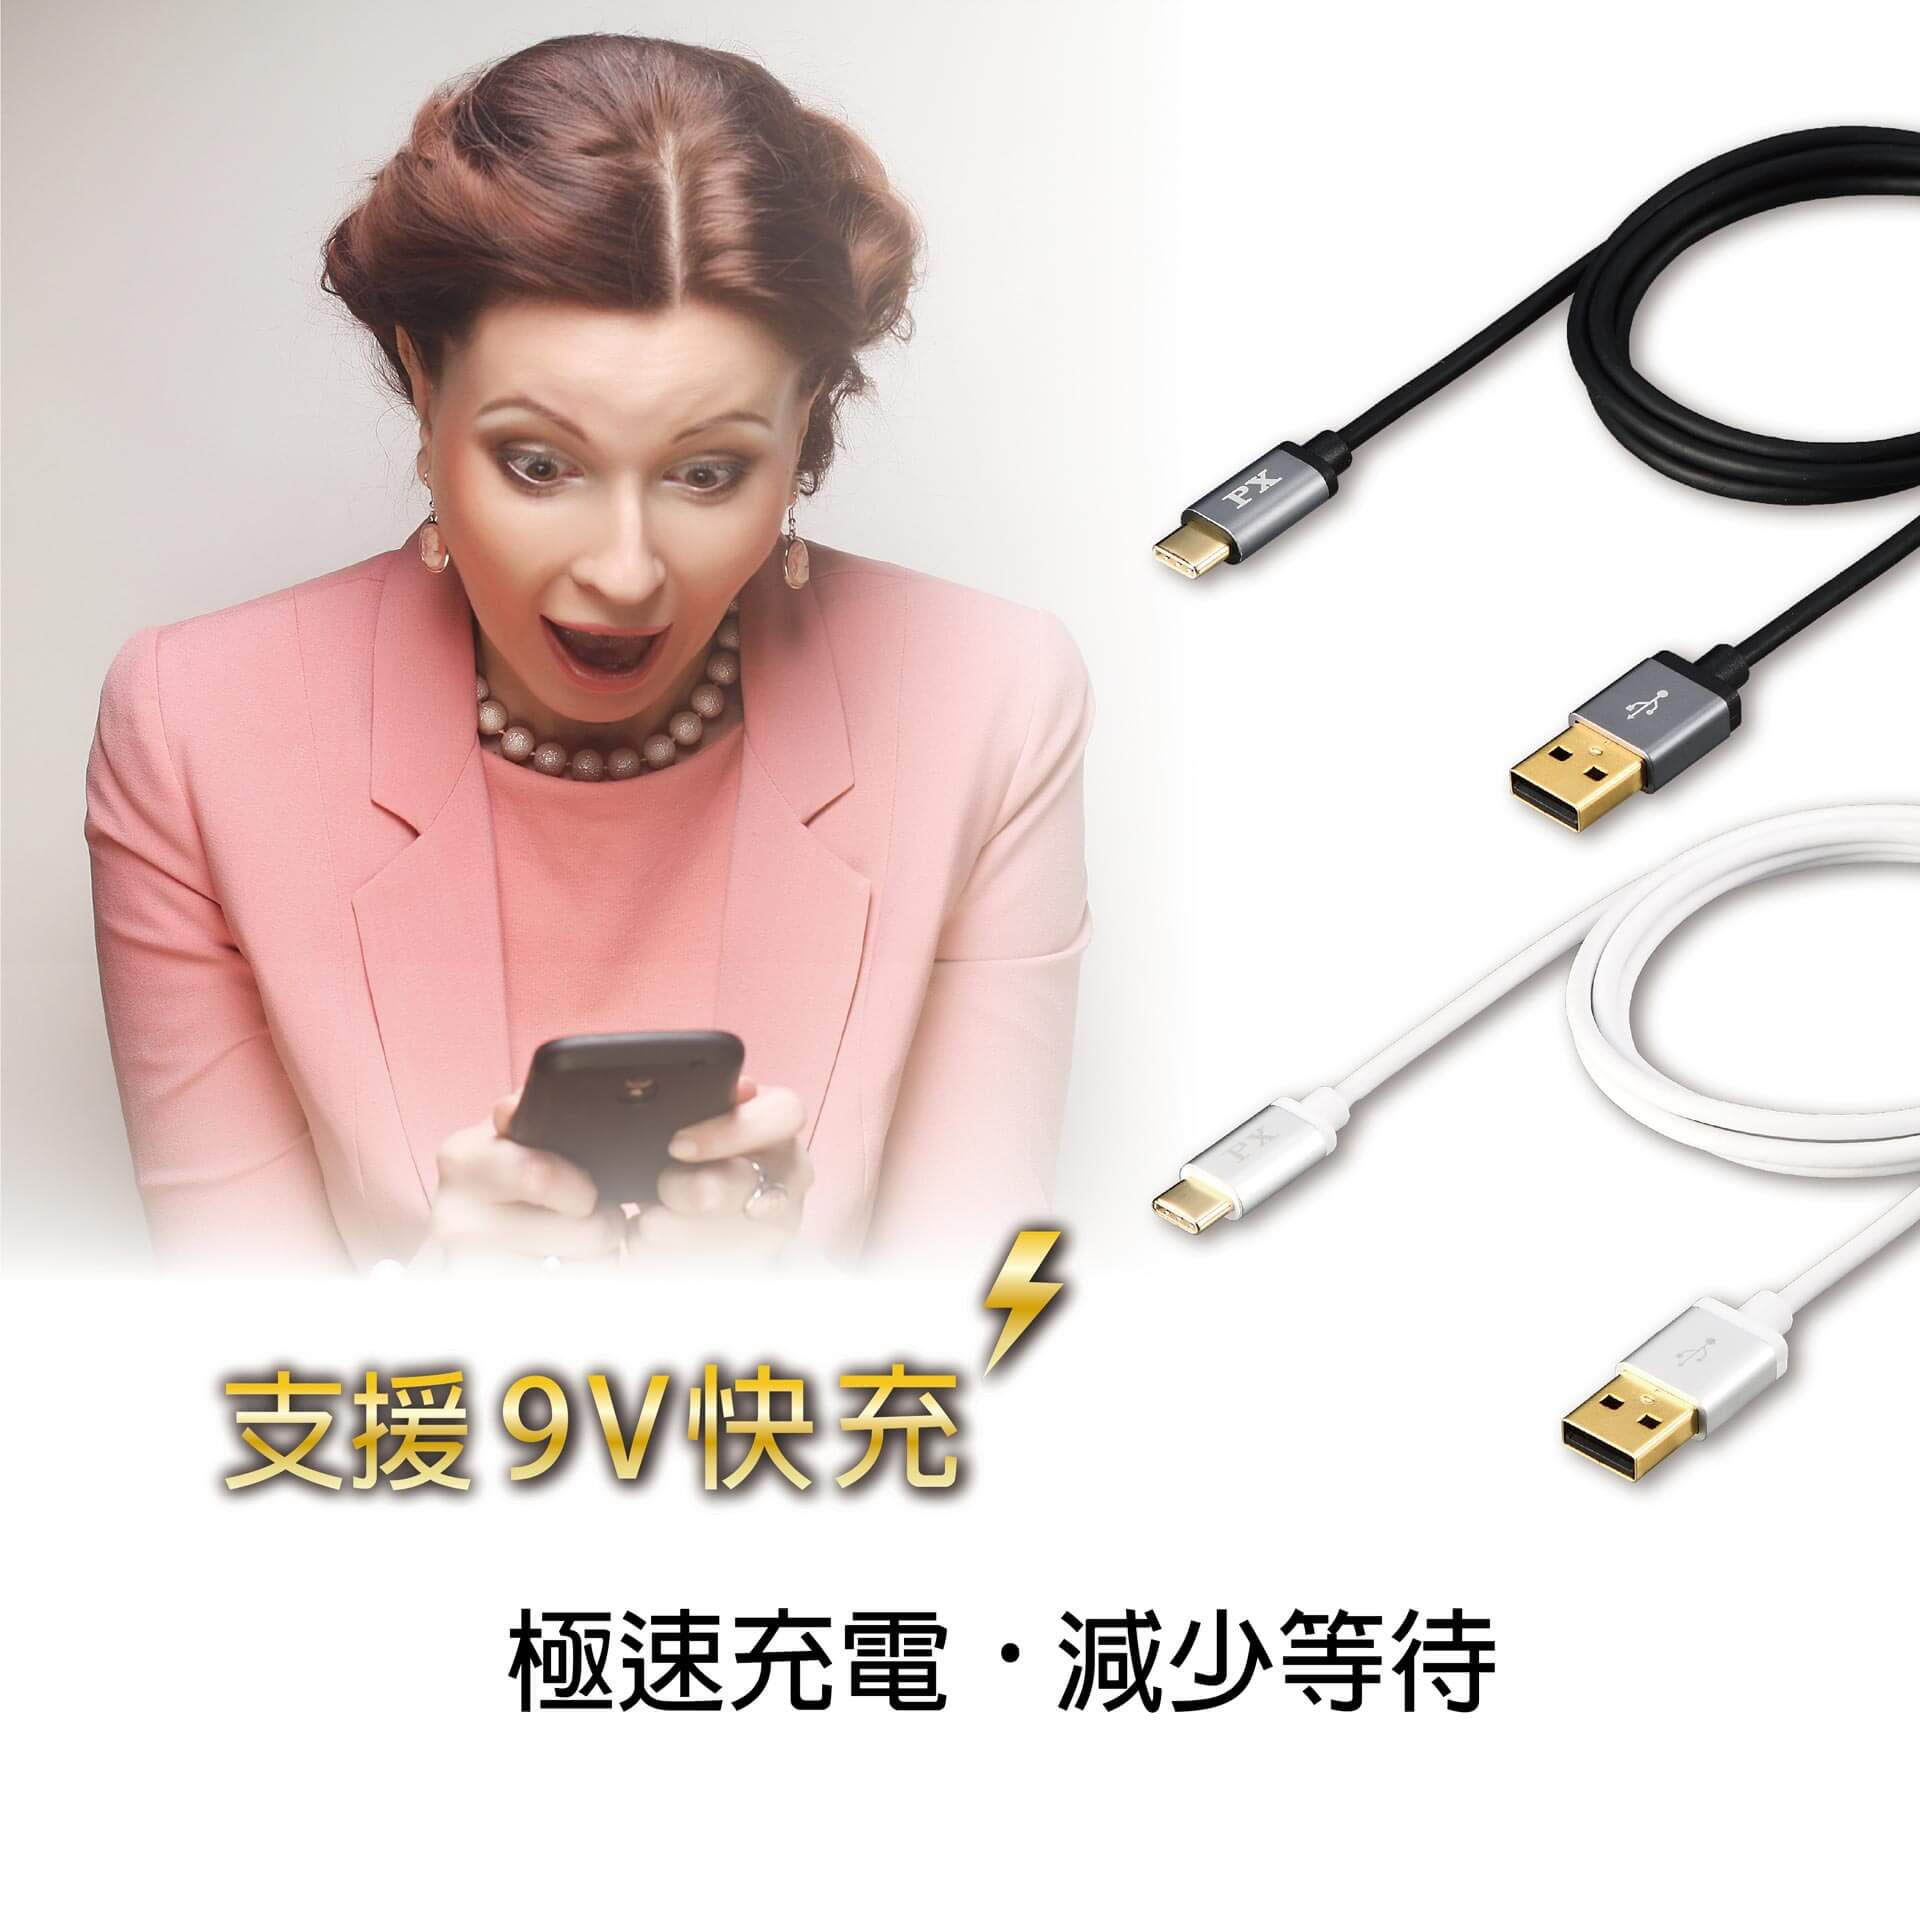 proimages/product/pro-02/pro02-001/UAC2-0_25B/UAC2-0_25B-5.jpg